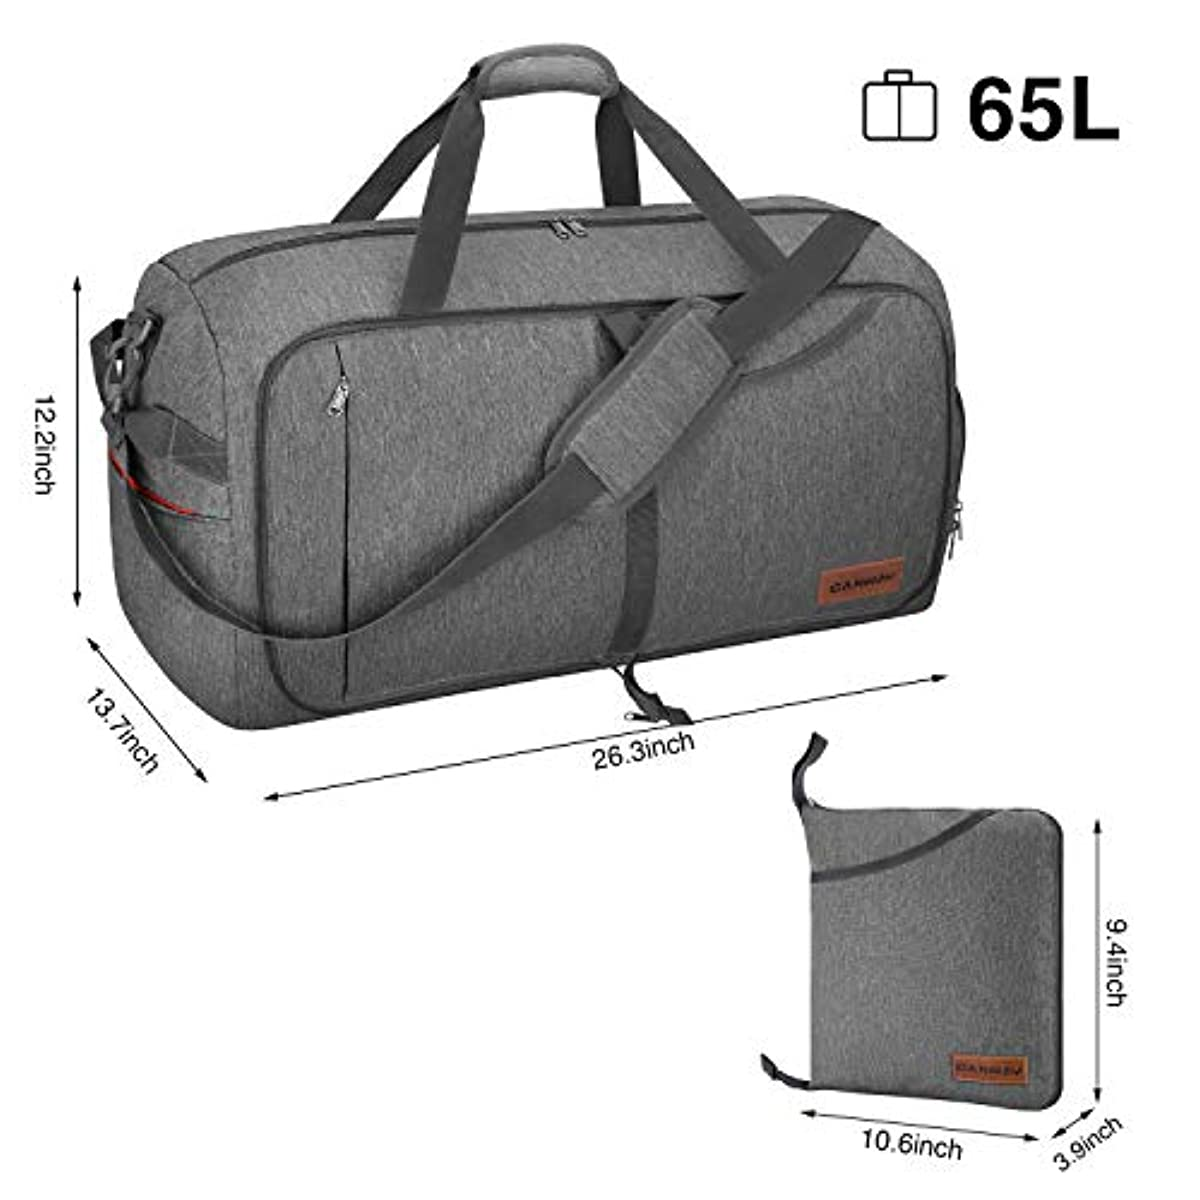 Canway 65L Travel Duffel Bag 3314fecd7935a